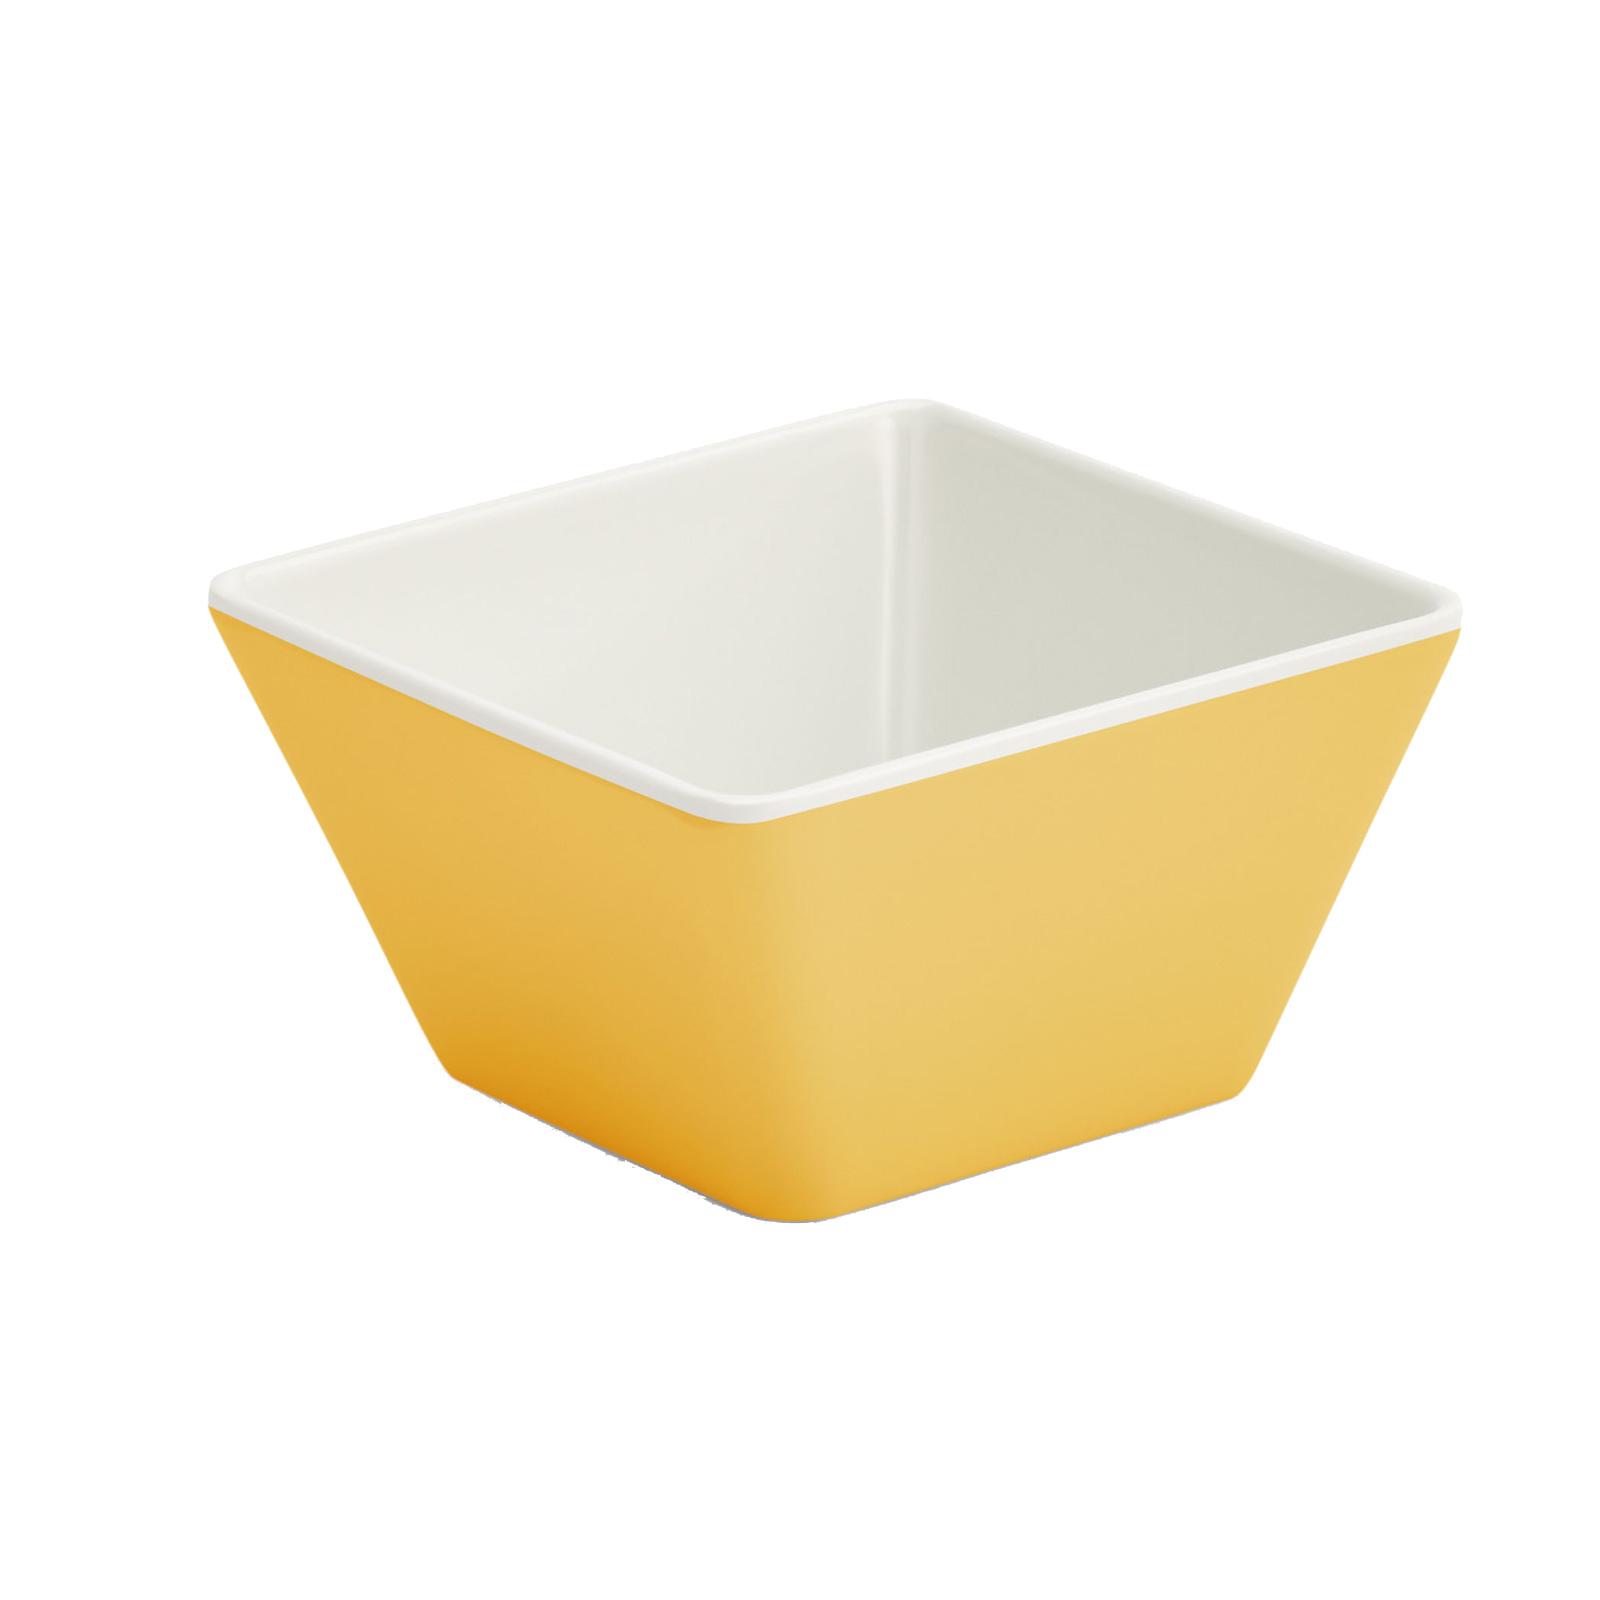 Vollrath V2220050 bowl, plastic,  0 - 31 oz